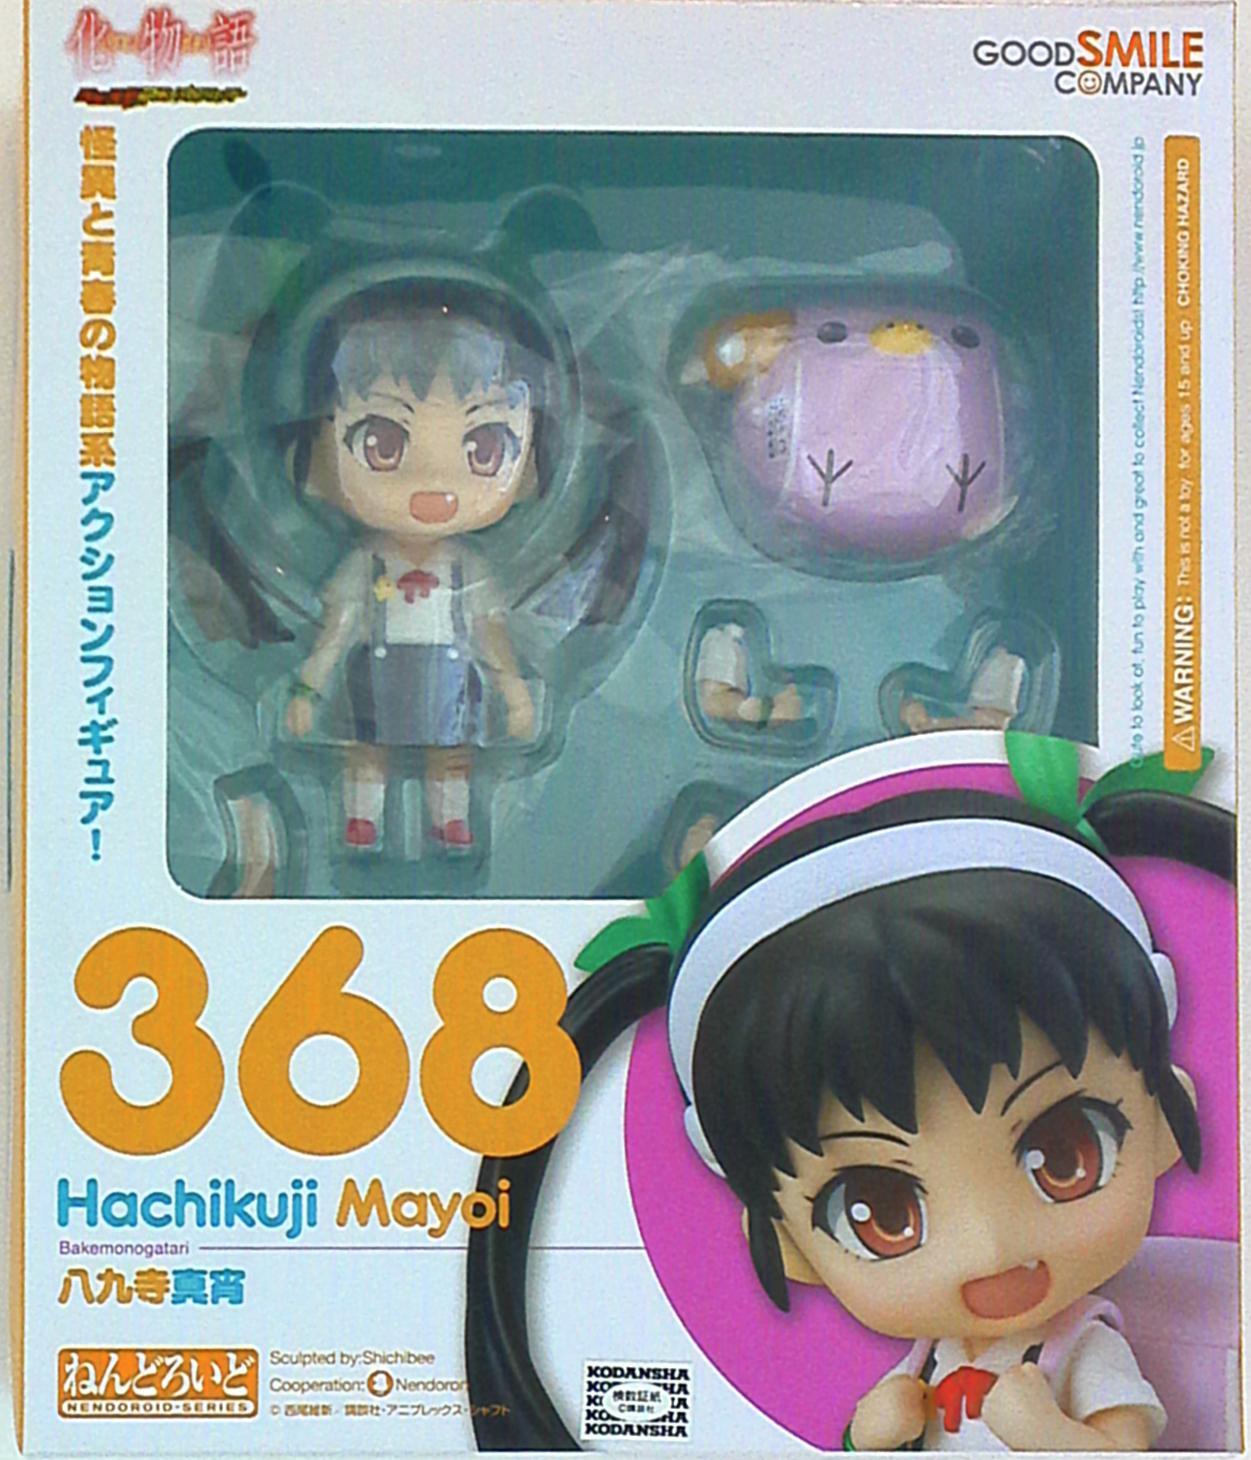 Nendoroid Bakemonogatari Hachikuji Mayoi Figure Good Smile Company 368 Japan